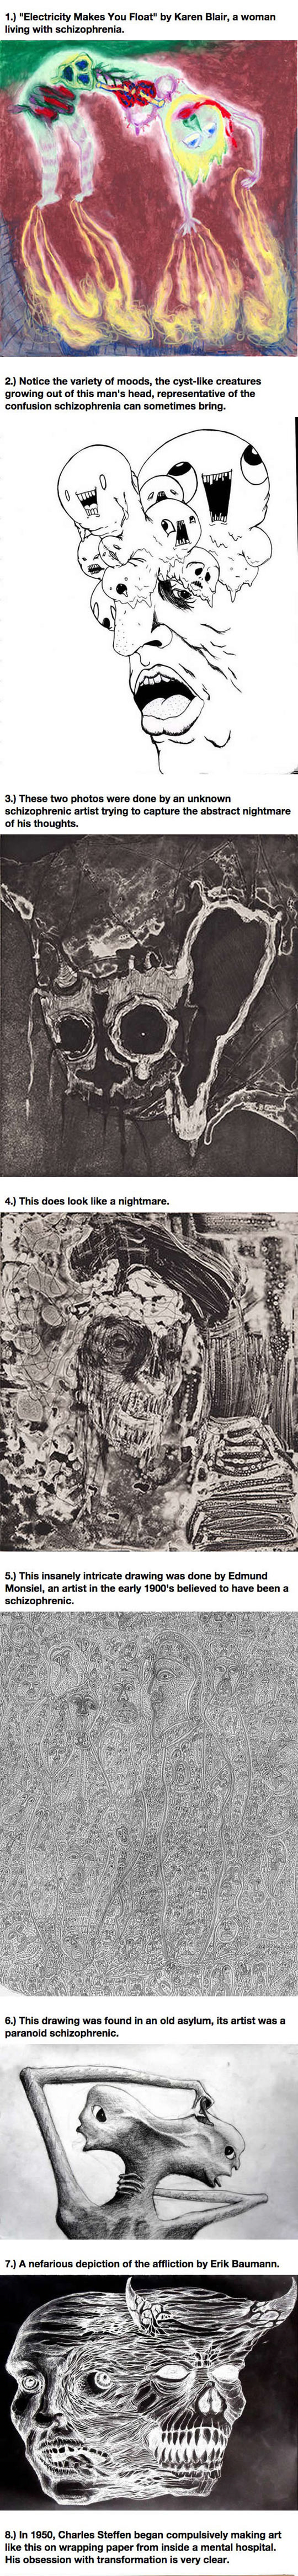 funny-schizophrenic-art-disease-painting